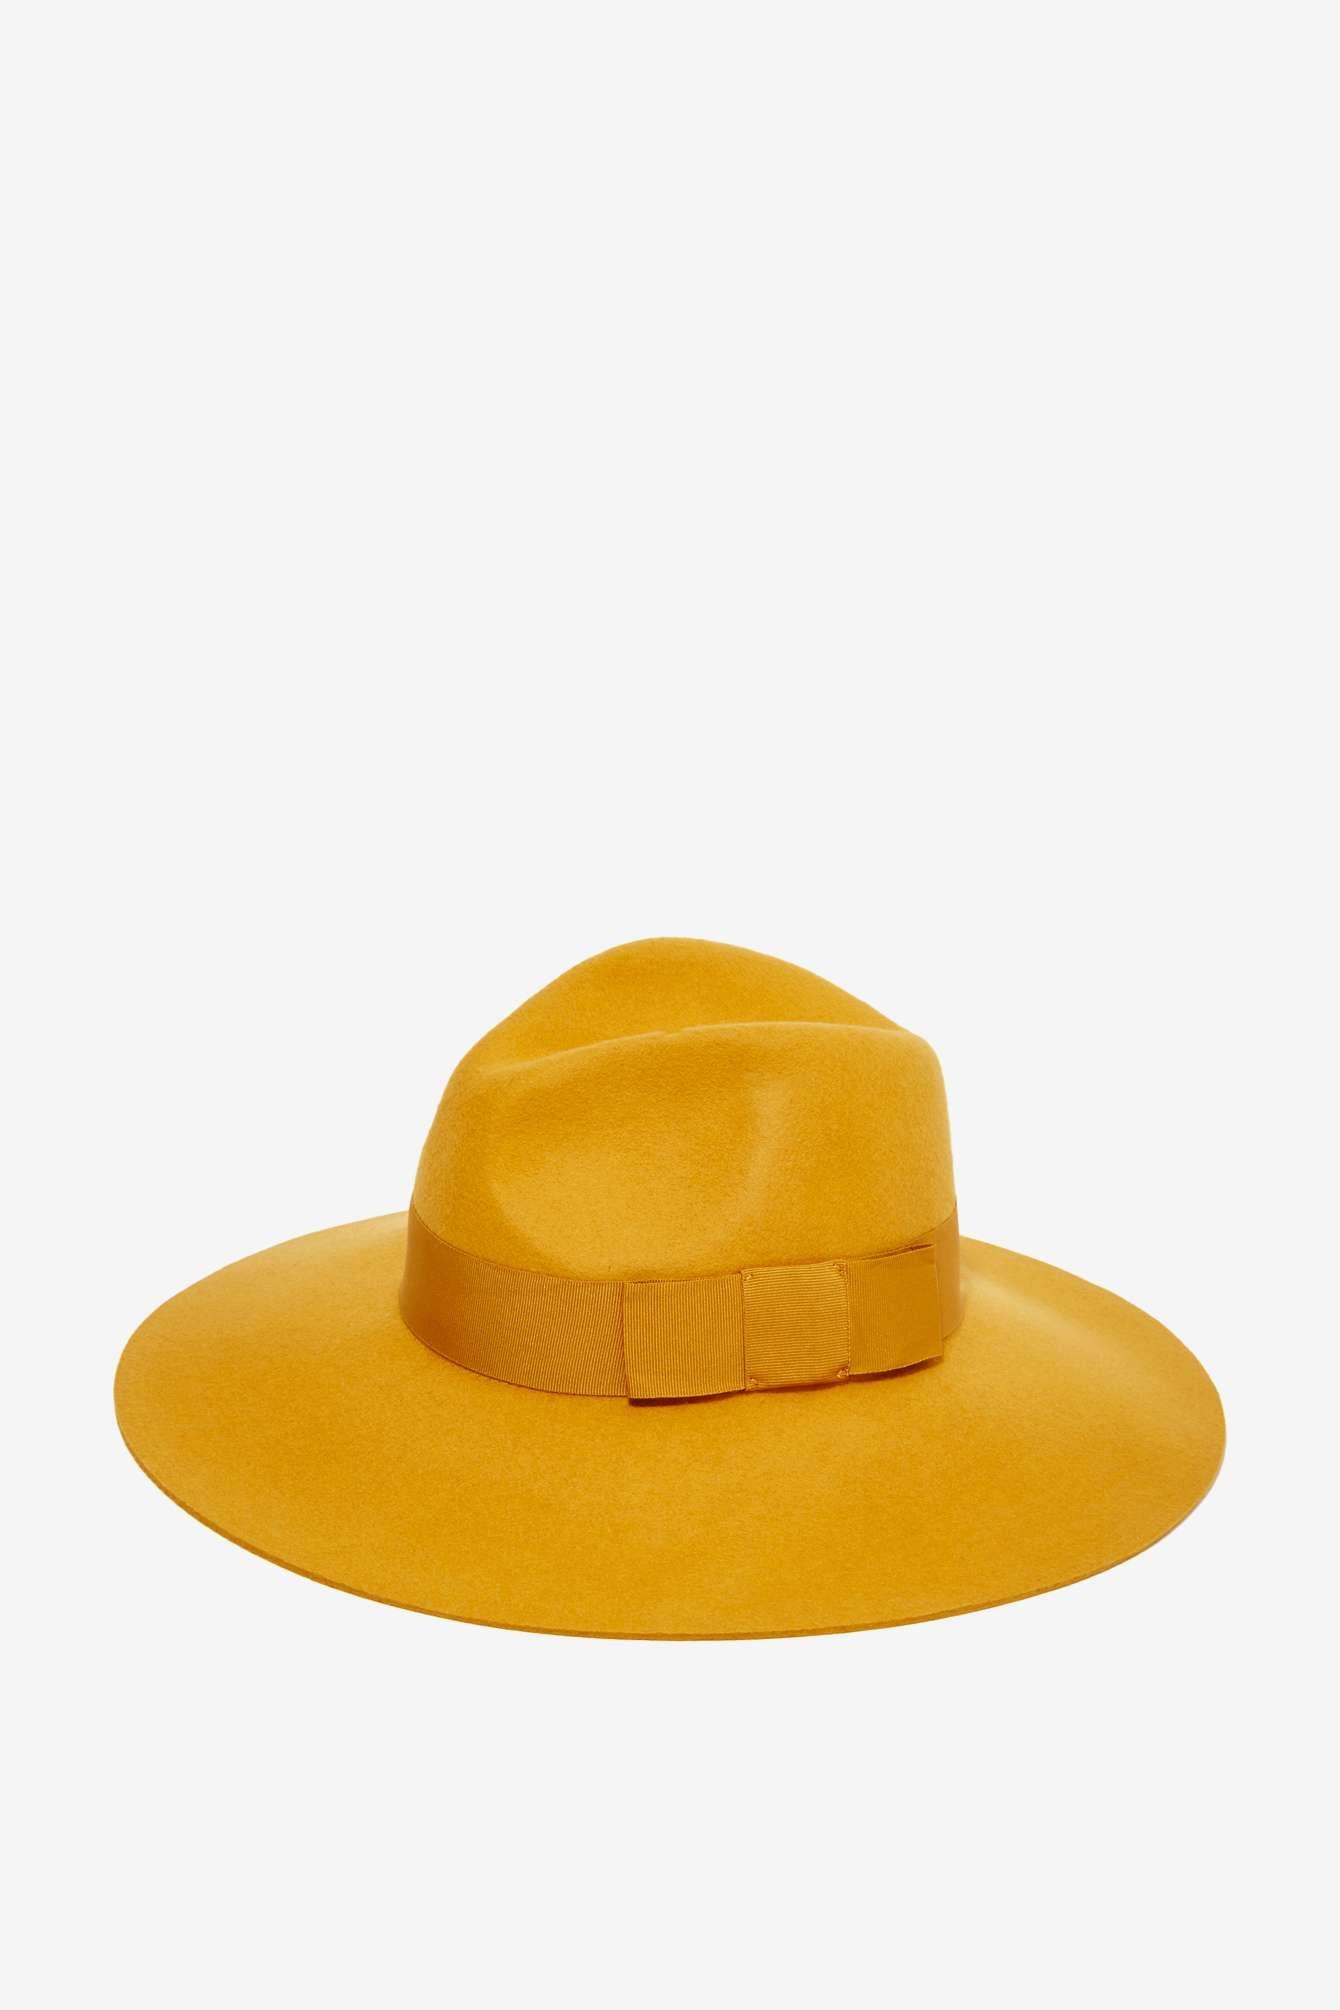 Brixton Piper Wool Hat - Mustard  184ef2fe39e